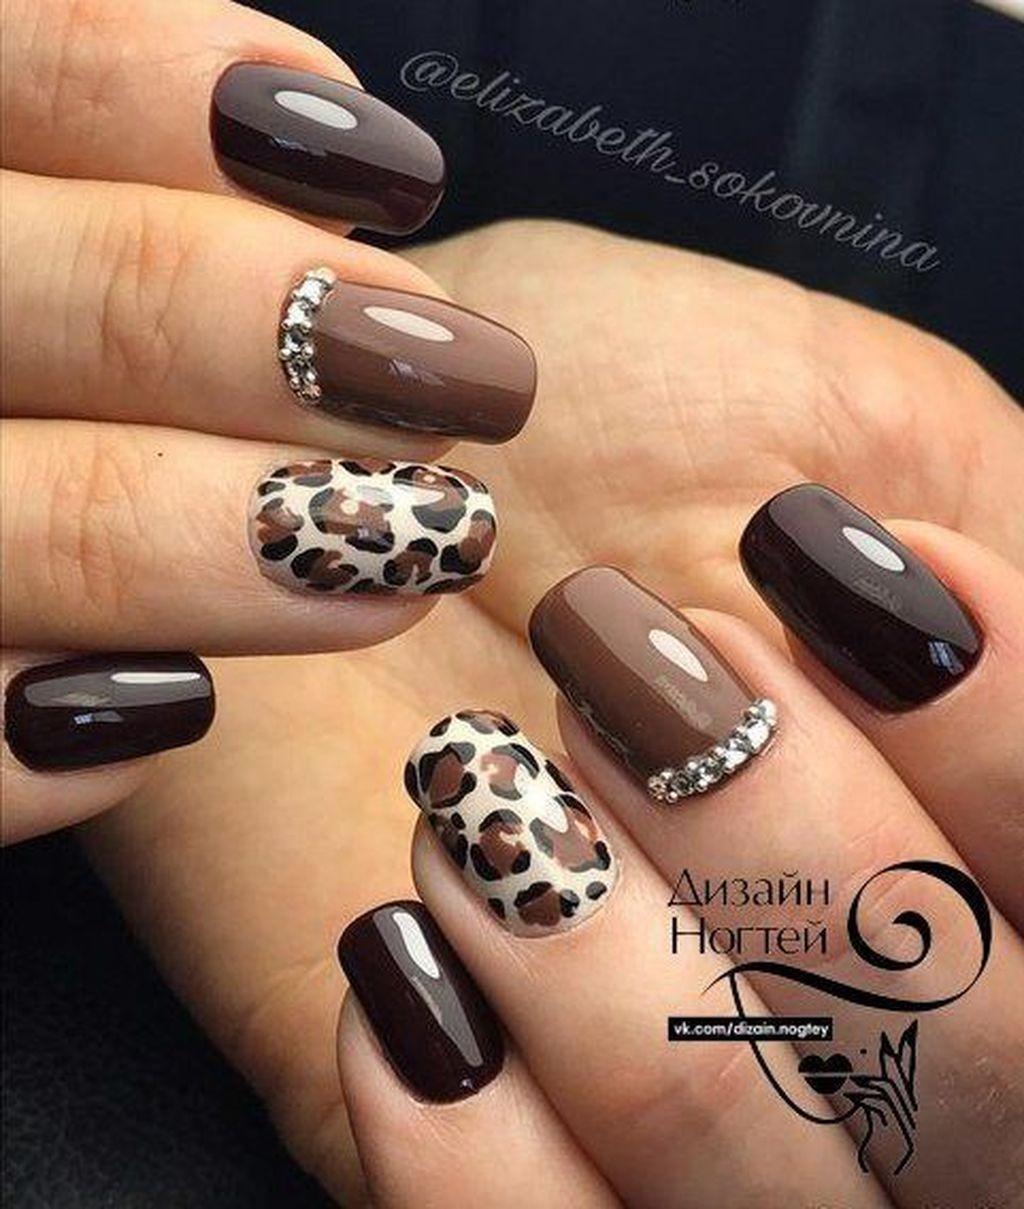 30 Adorable Autumn Nail Art Designs Ideas That Looks Cool Brown Nail Art Brown Nails Design Fall Time Nails